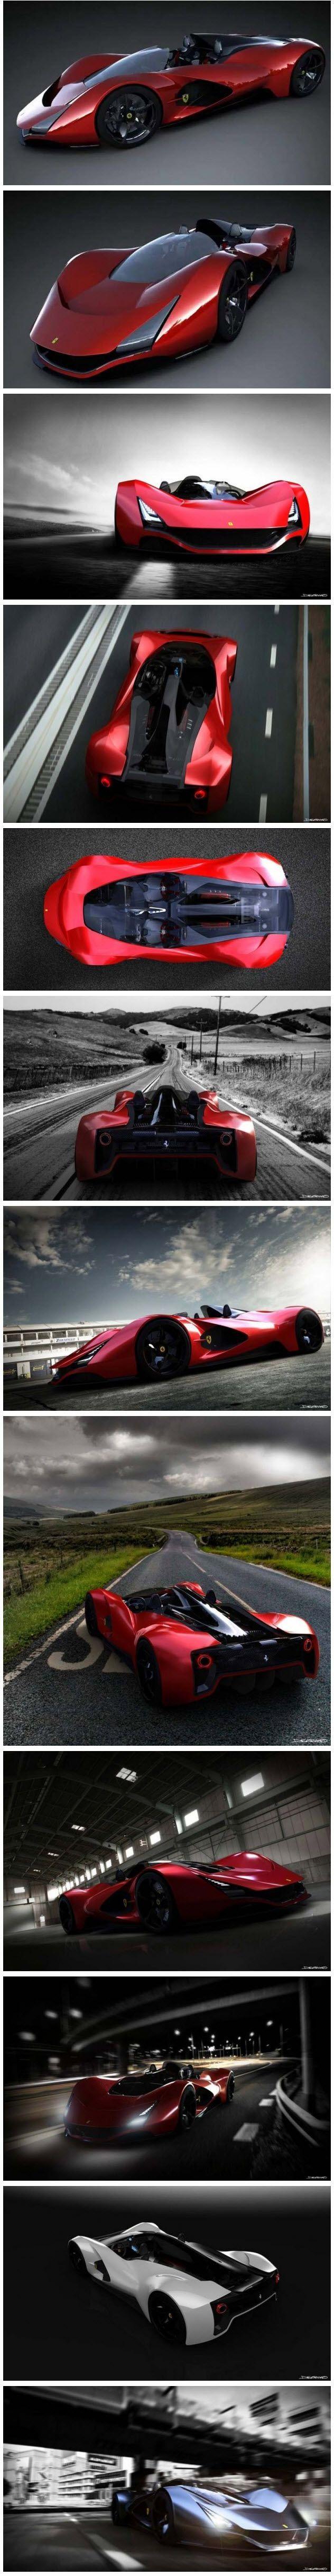 Ferrari Aliante, Such an amazing concept car. More - https://www.luxury.guugles.com/ferrari-aliante-such-an-amazing-concept-car-more/